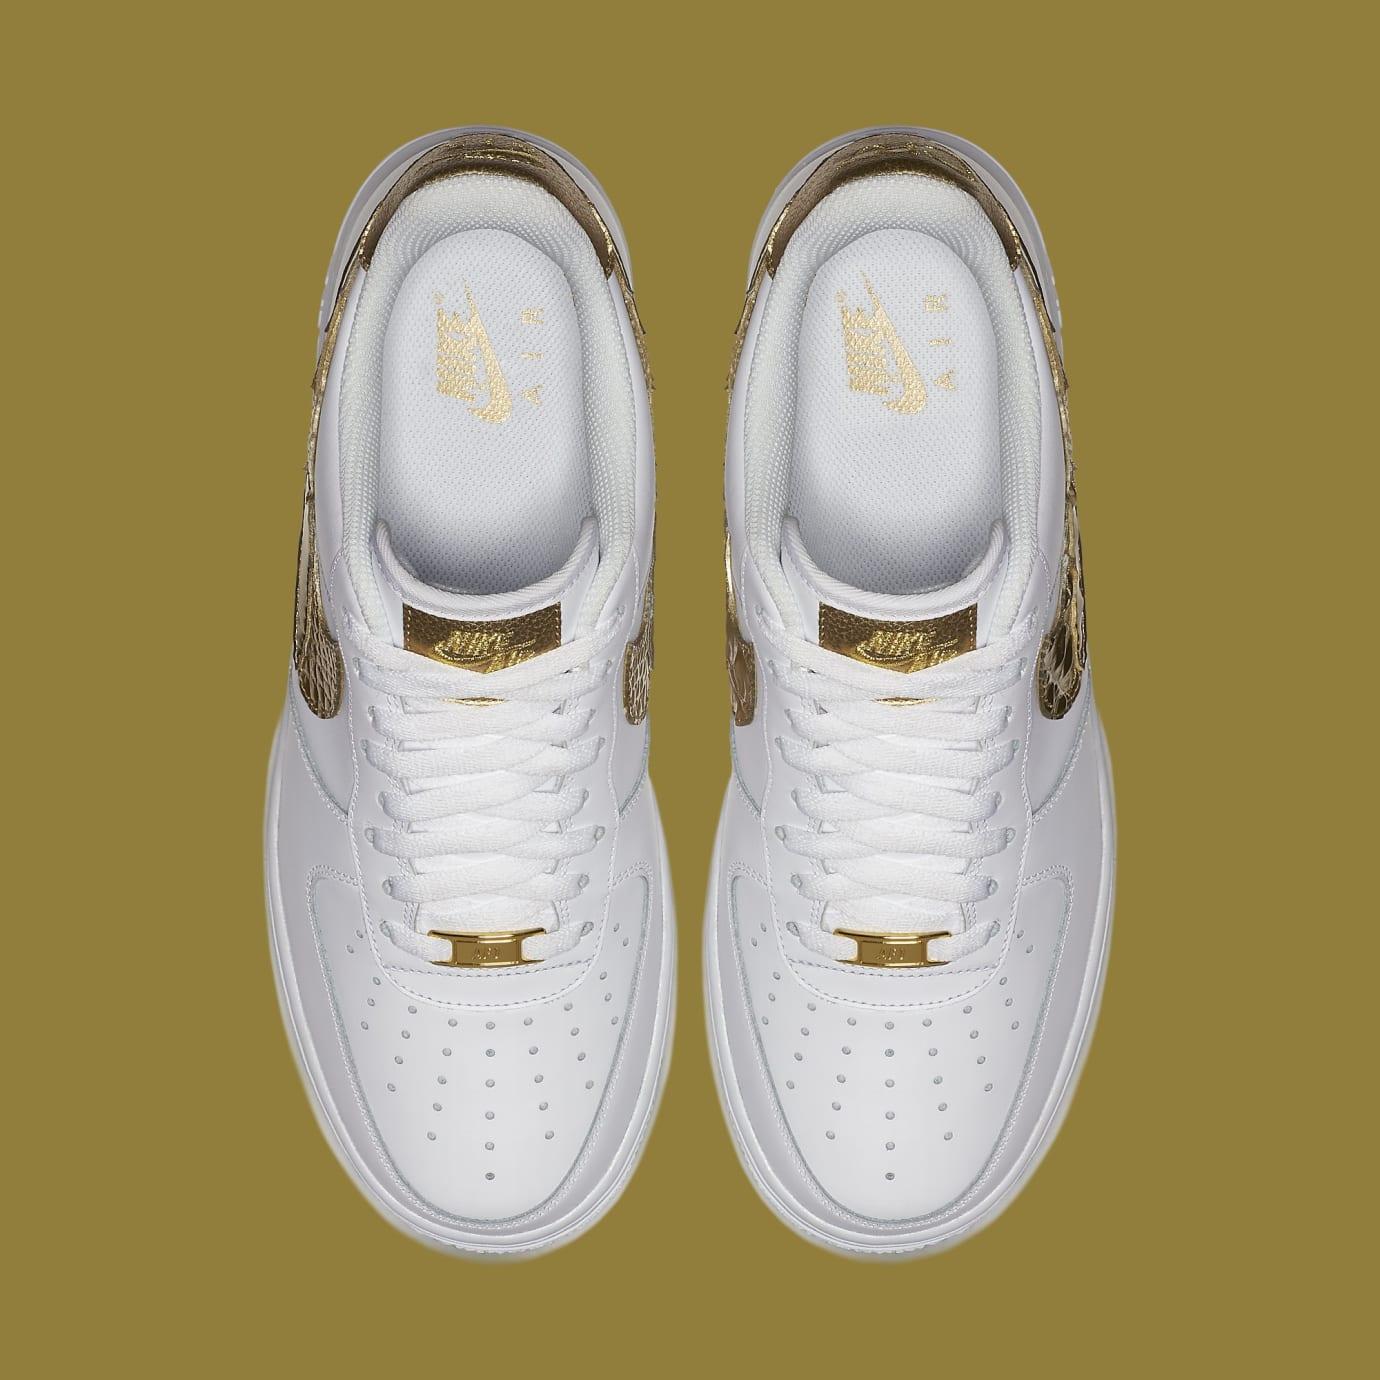 Nike Air Force 1 CR7 'Golden Patchwork' WeißGold | AQ0666 100